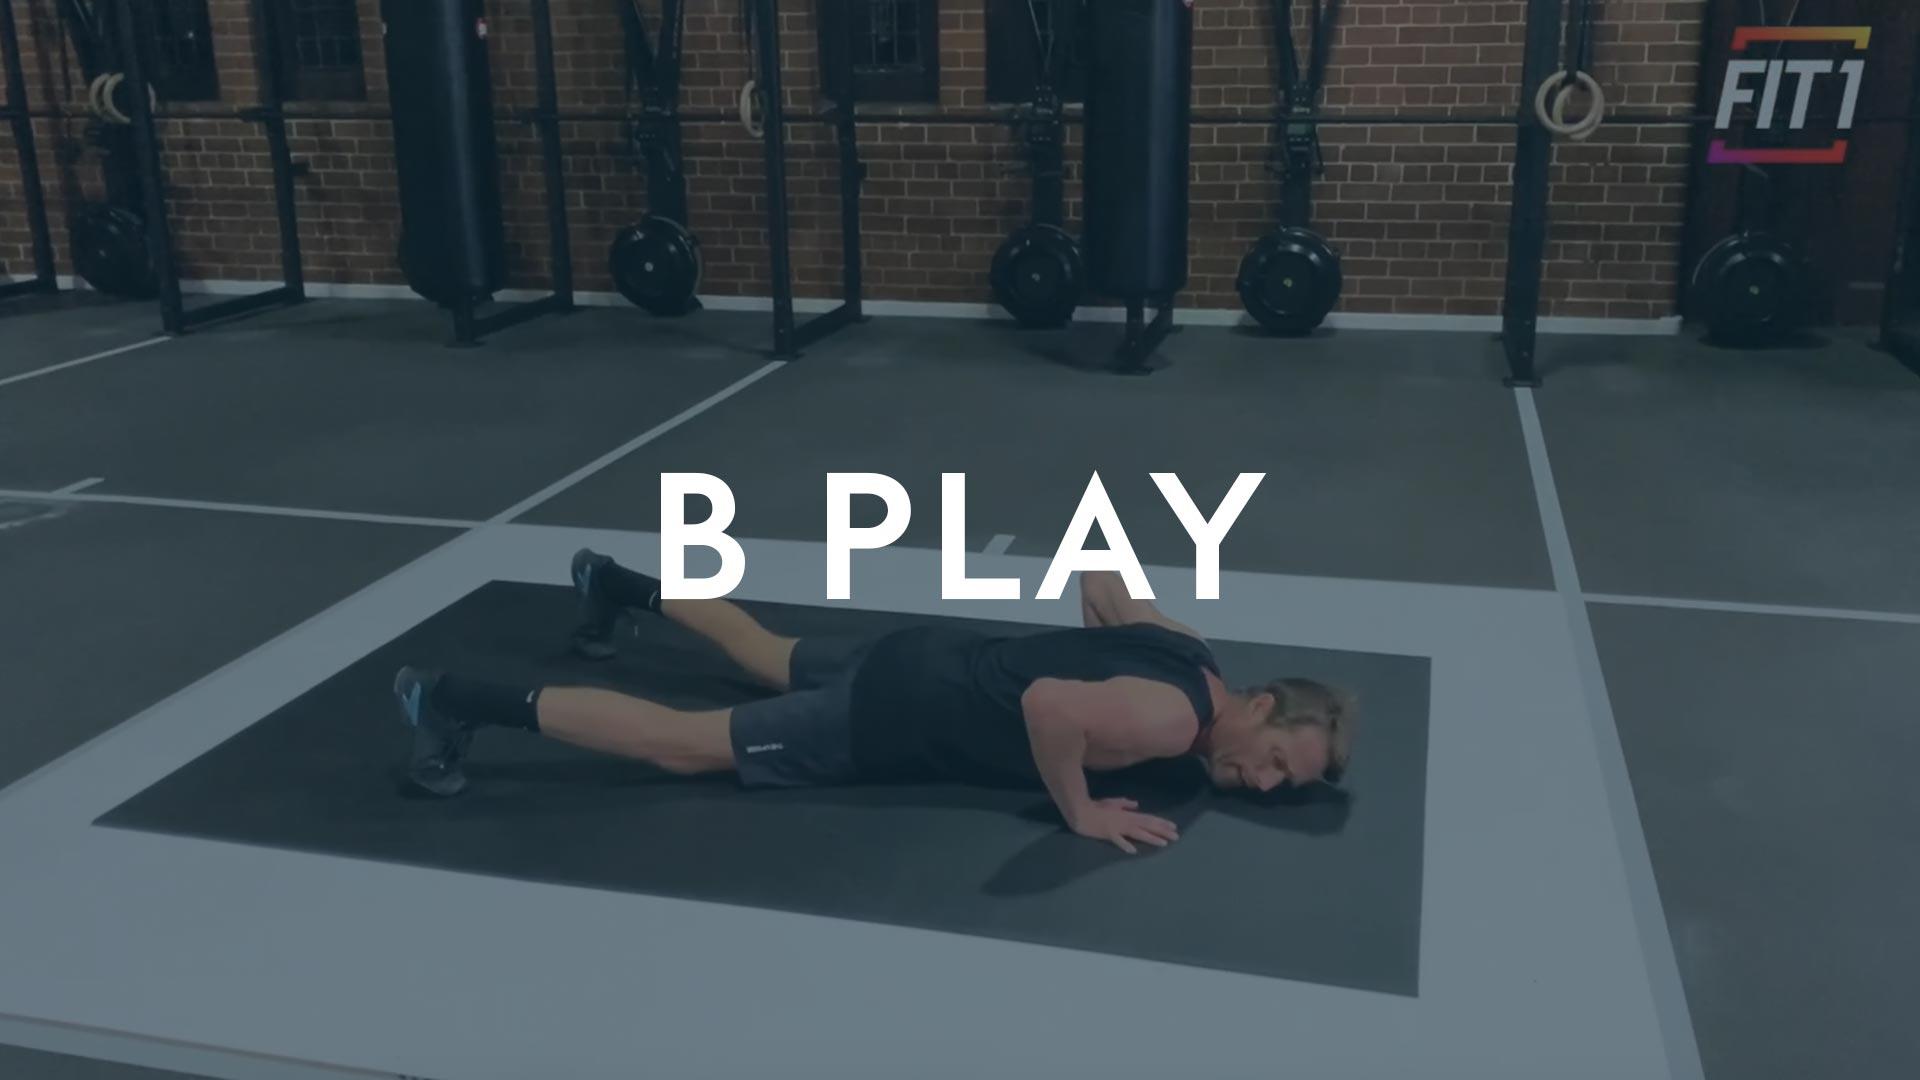 B Play